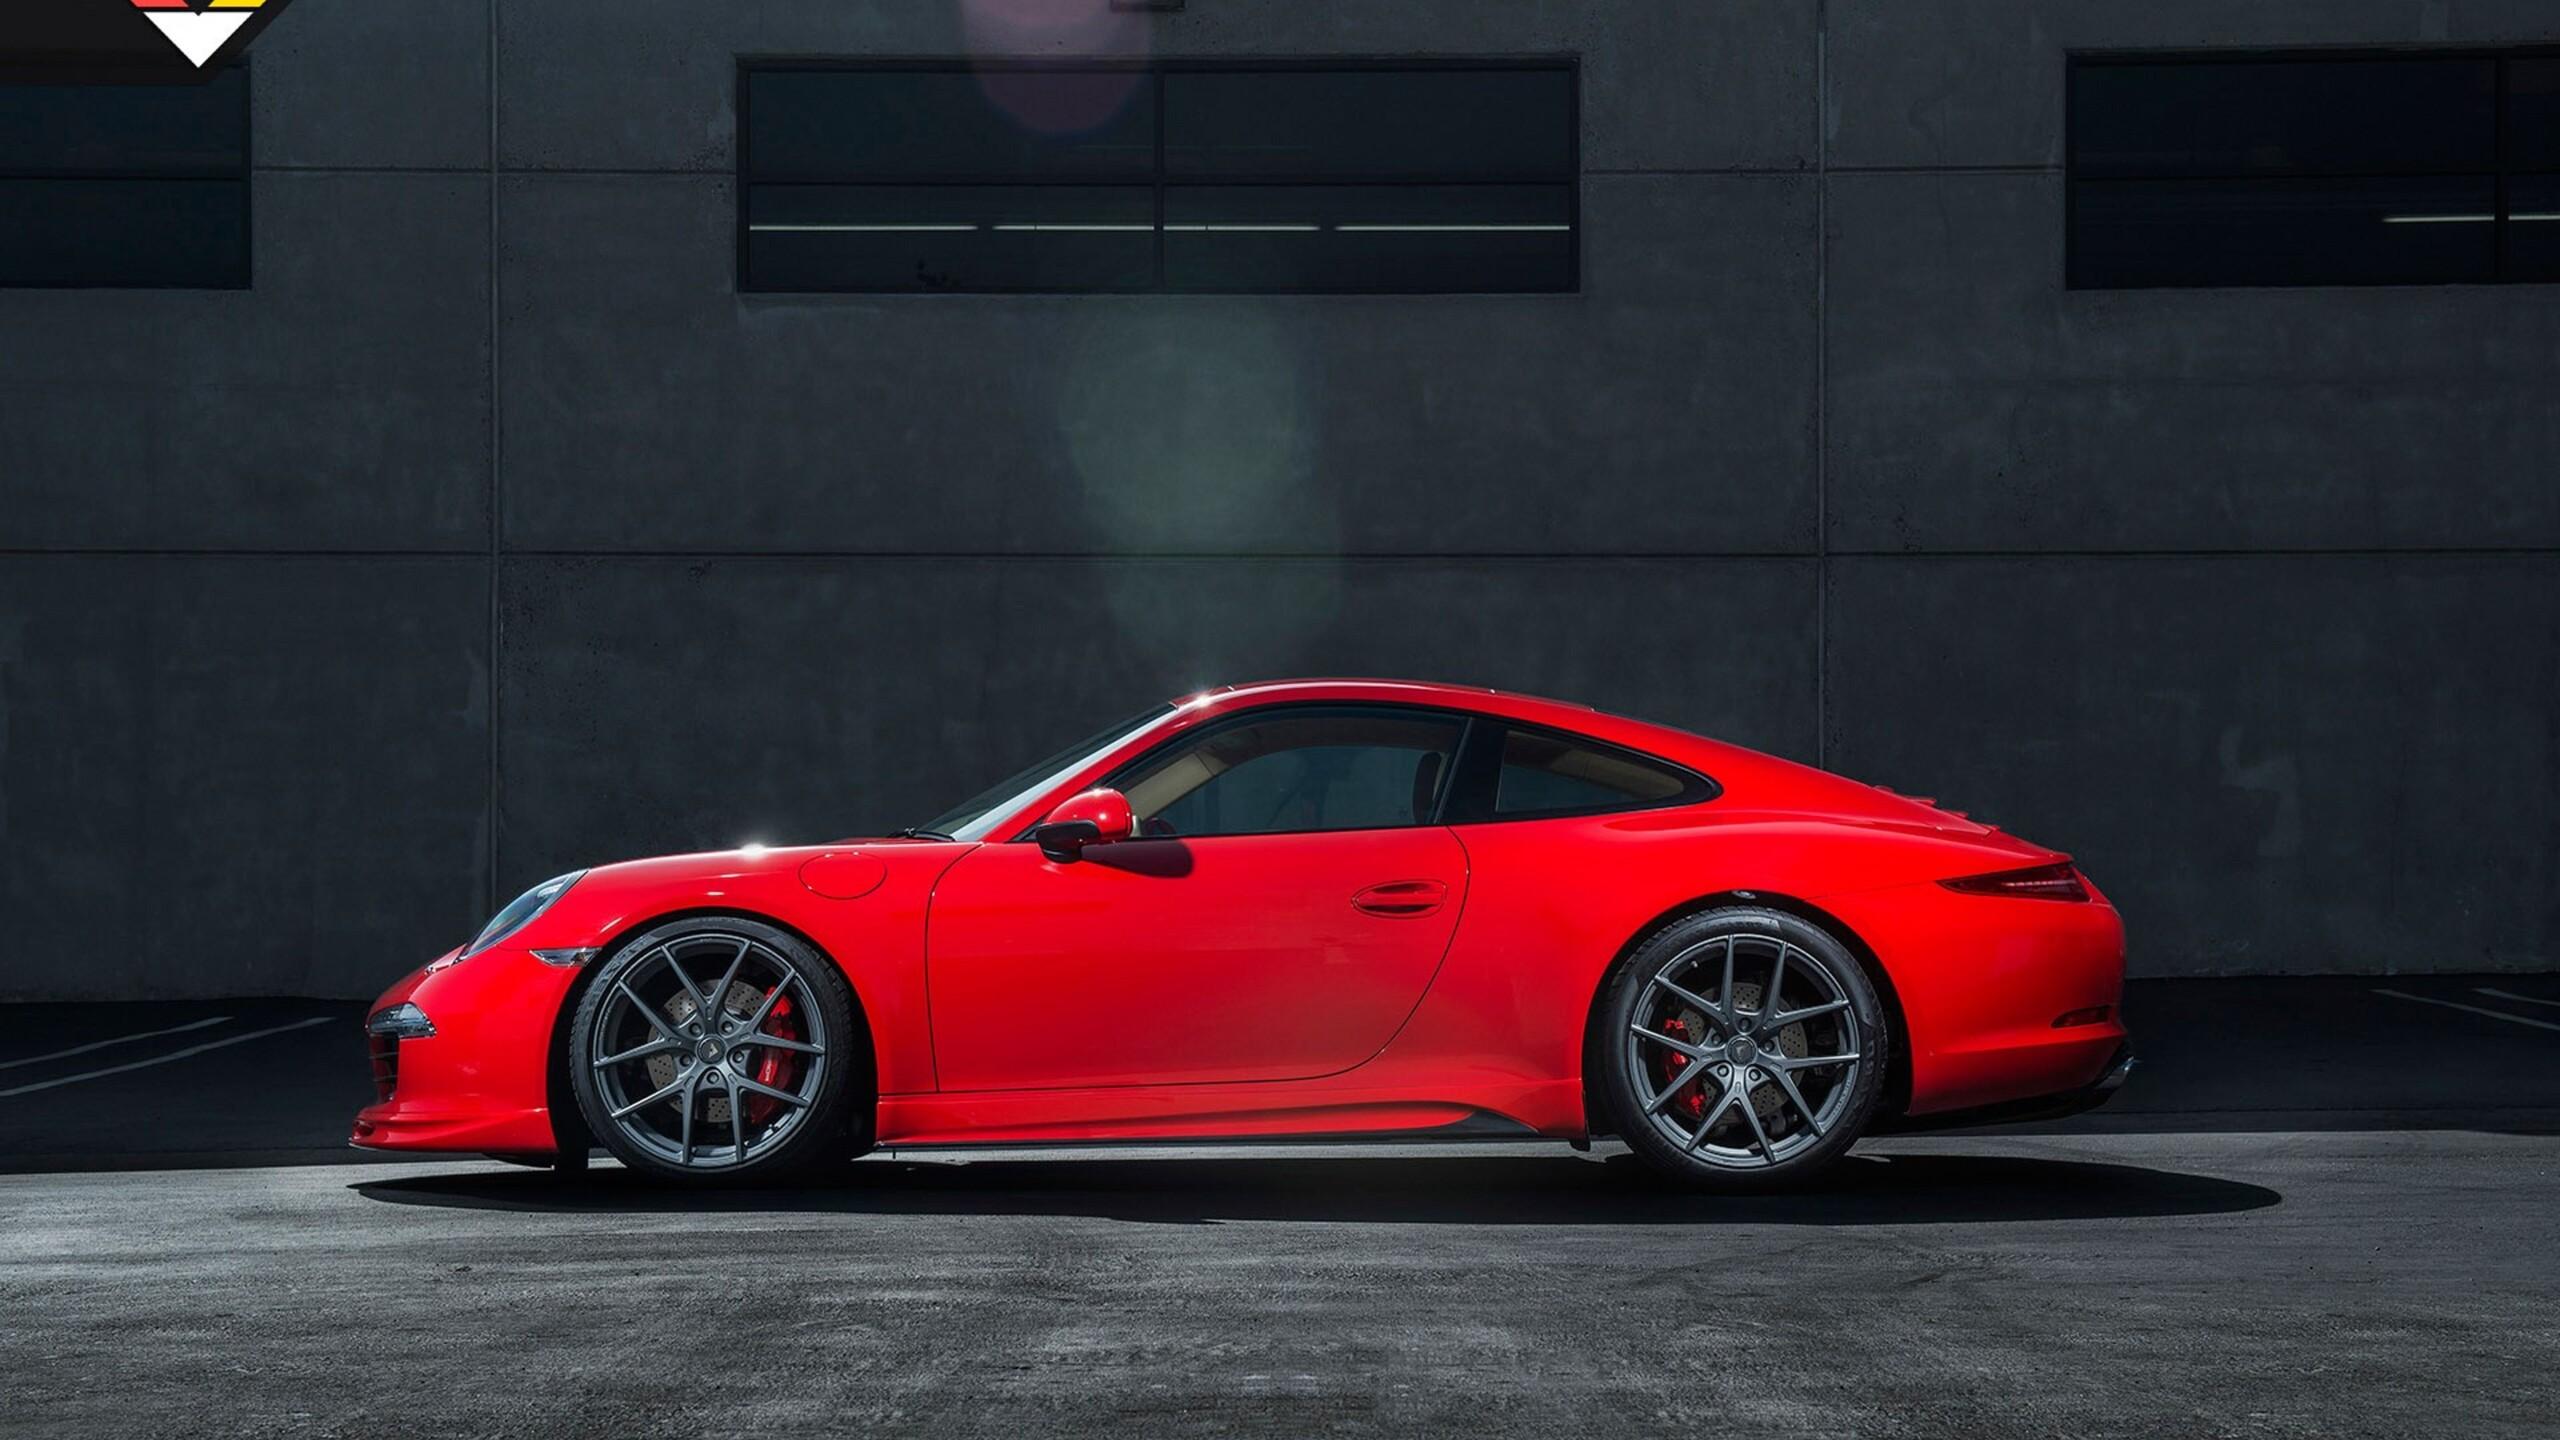 2560x1440 Porsche 991 Carrera S V Gt Edition 1440p